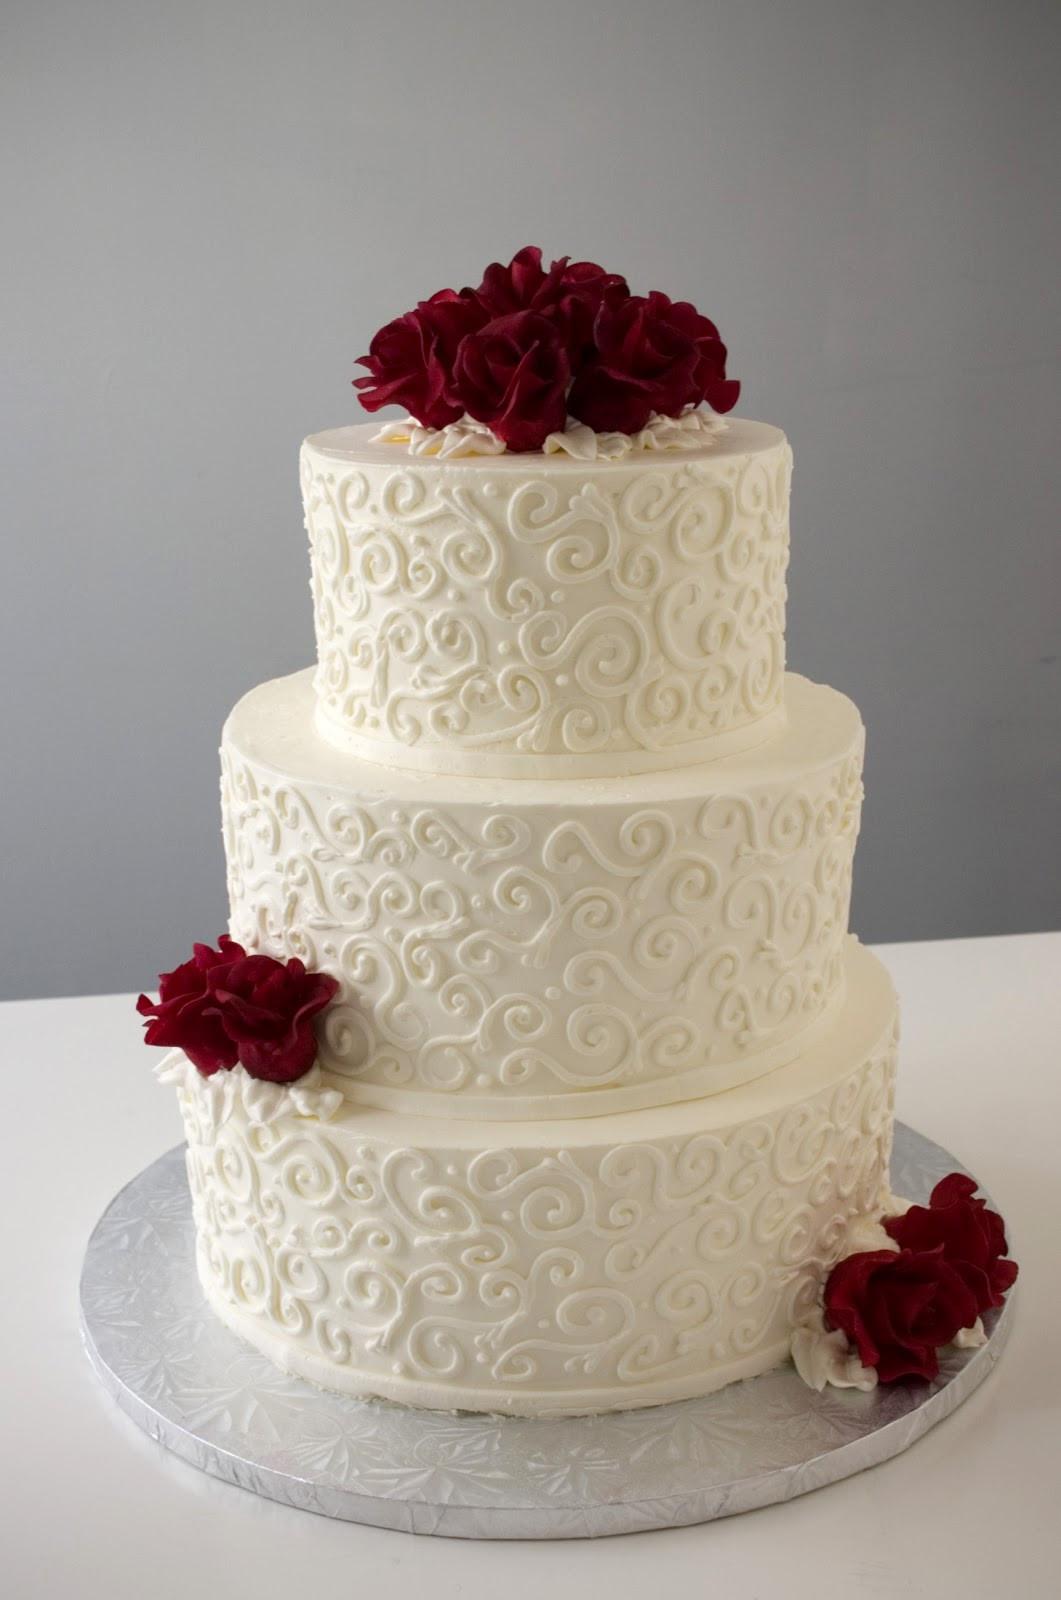 Wedding Cakes Simple  A Simple Cake Customizing A Simple Cake